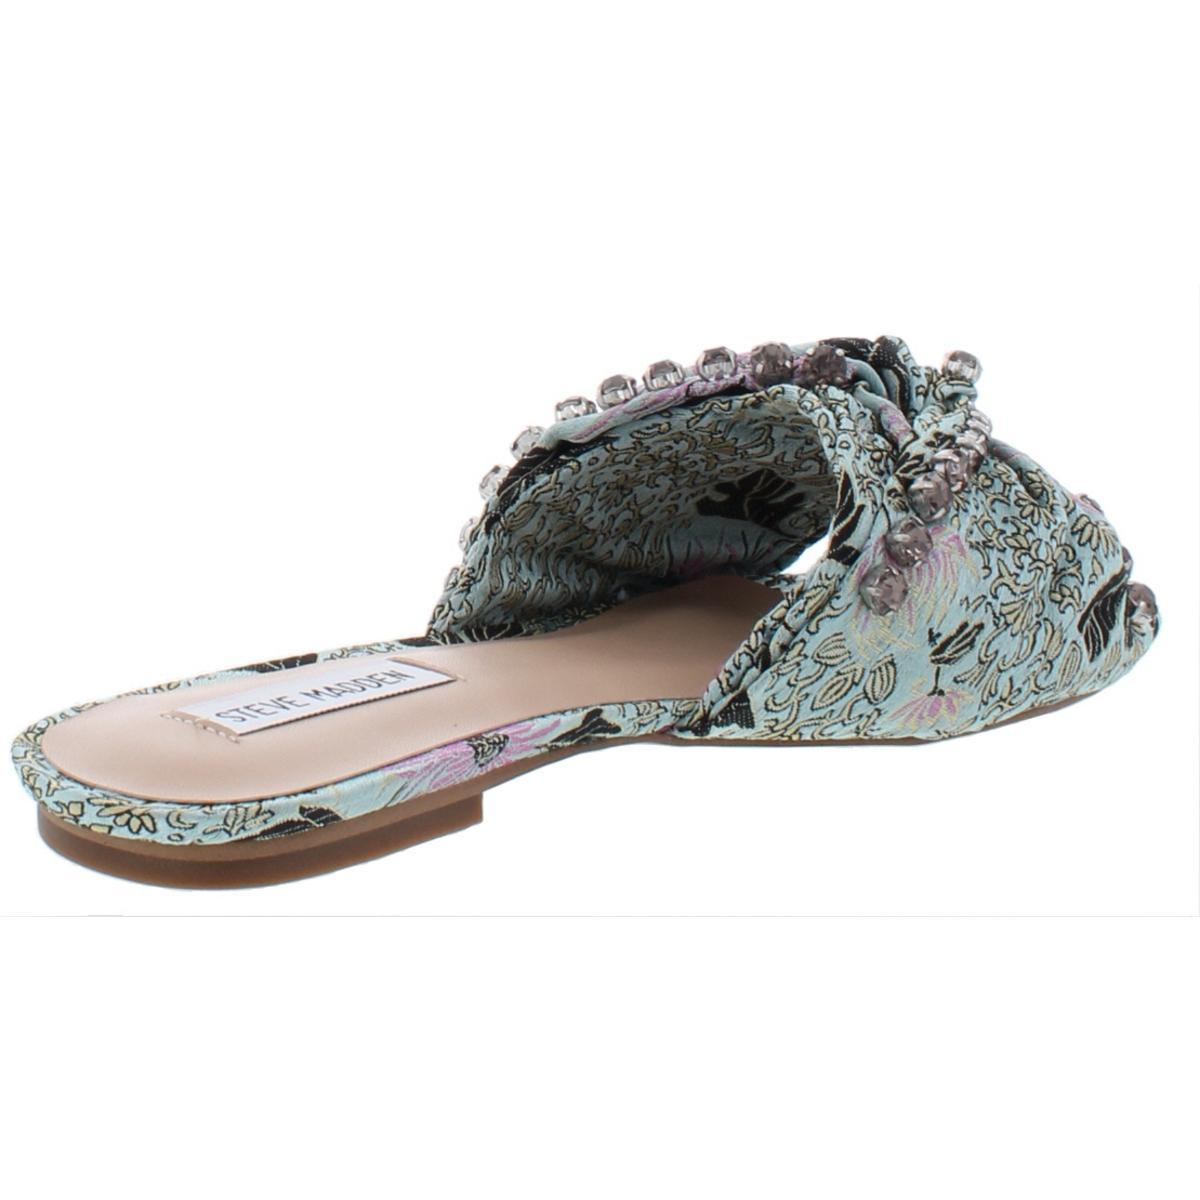 3f74fc188b1 Steve Madden Womens Cheeky Multi Slides Flats Shoes 6 Medium (b M) BHFO 4828